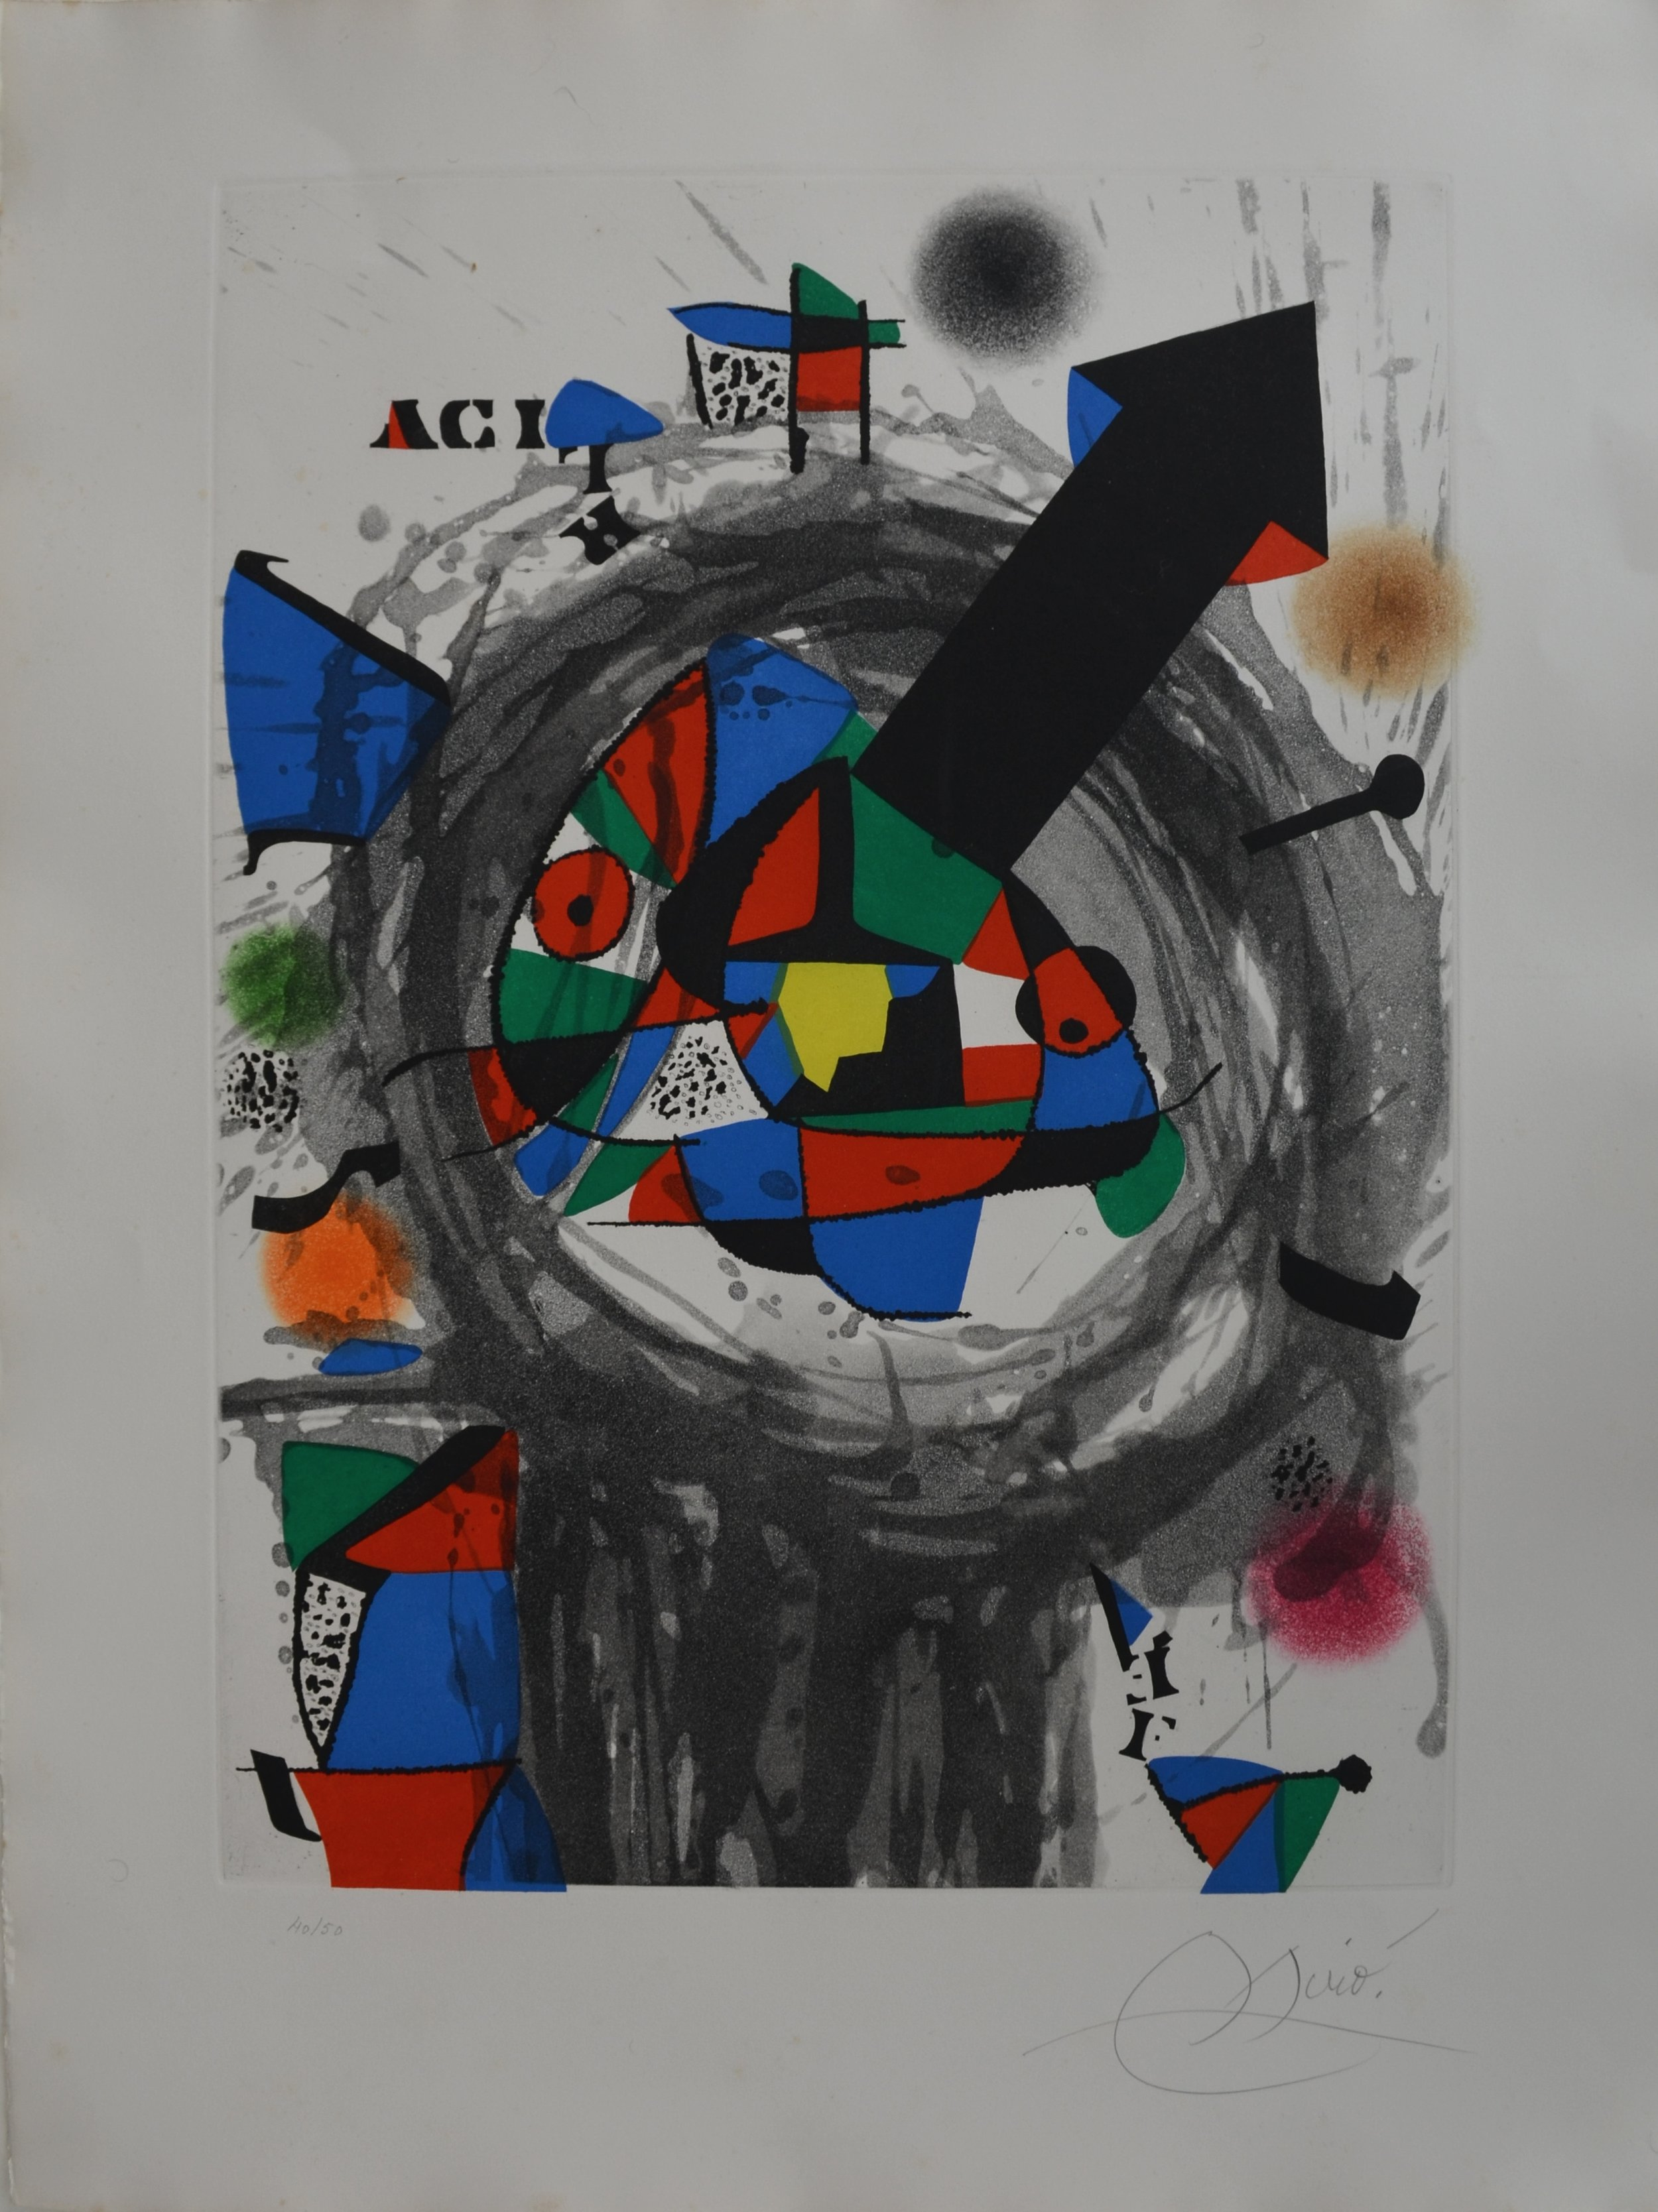 Color wash, etching and aquatint titled  Personnage a la Fleche Noire  by Joan Miró